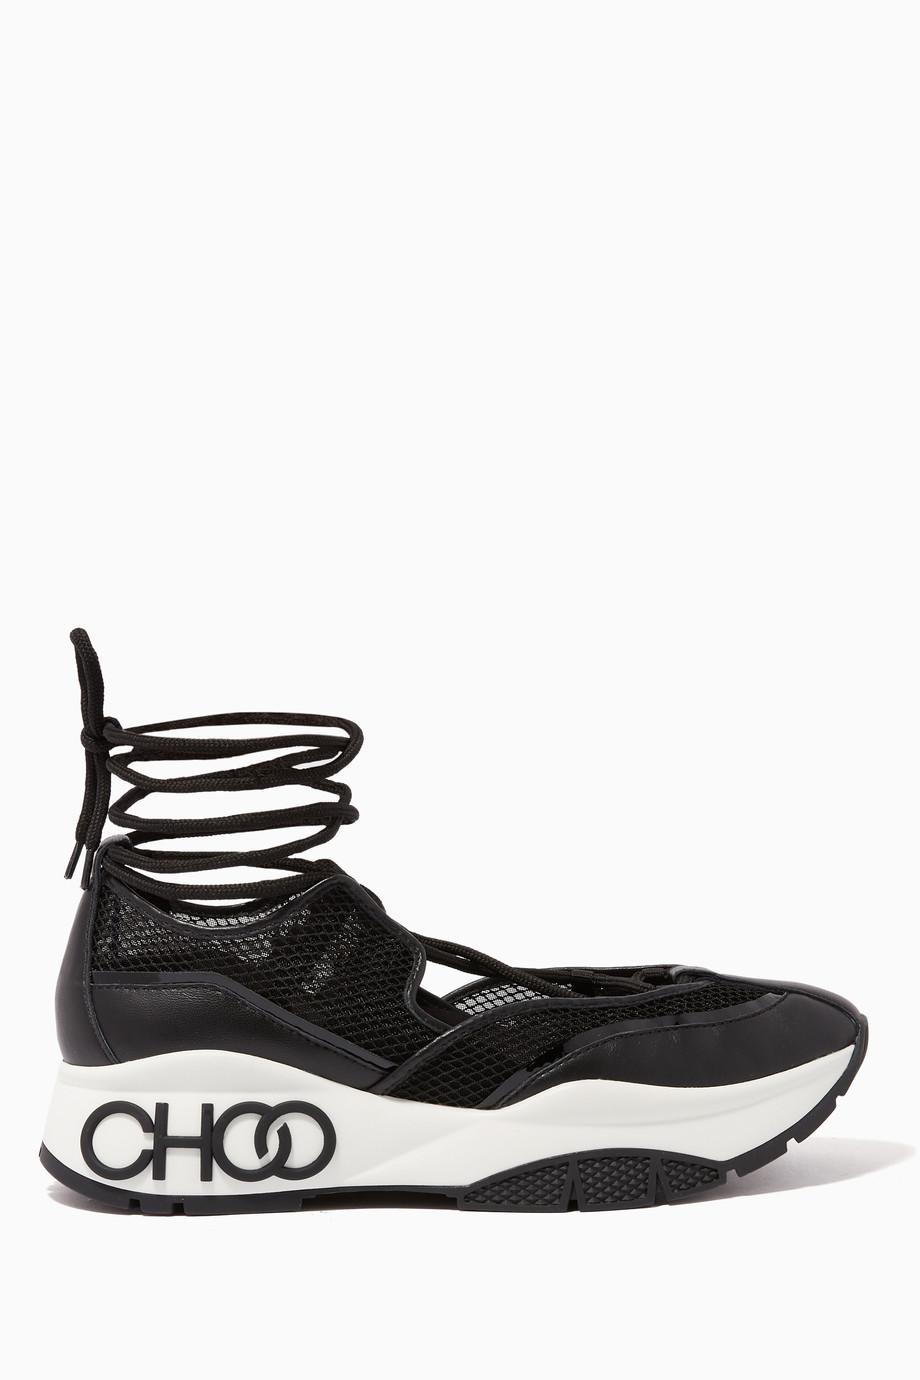 4bd1b2dd1c Shop Jimmy Choo Black Michigan Mesh & Patent Nappa Leather Sneakers ...